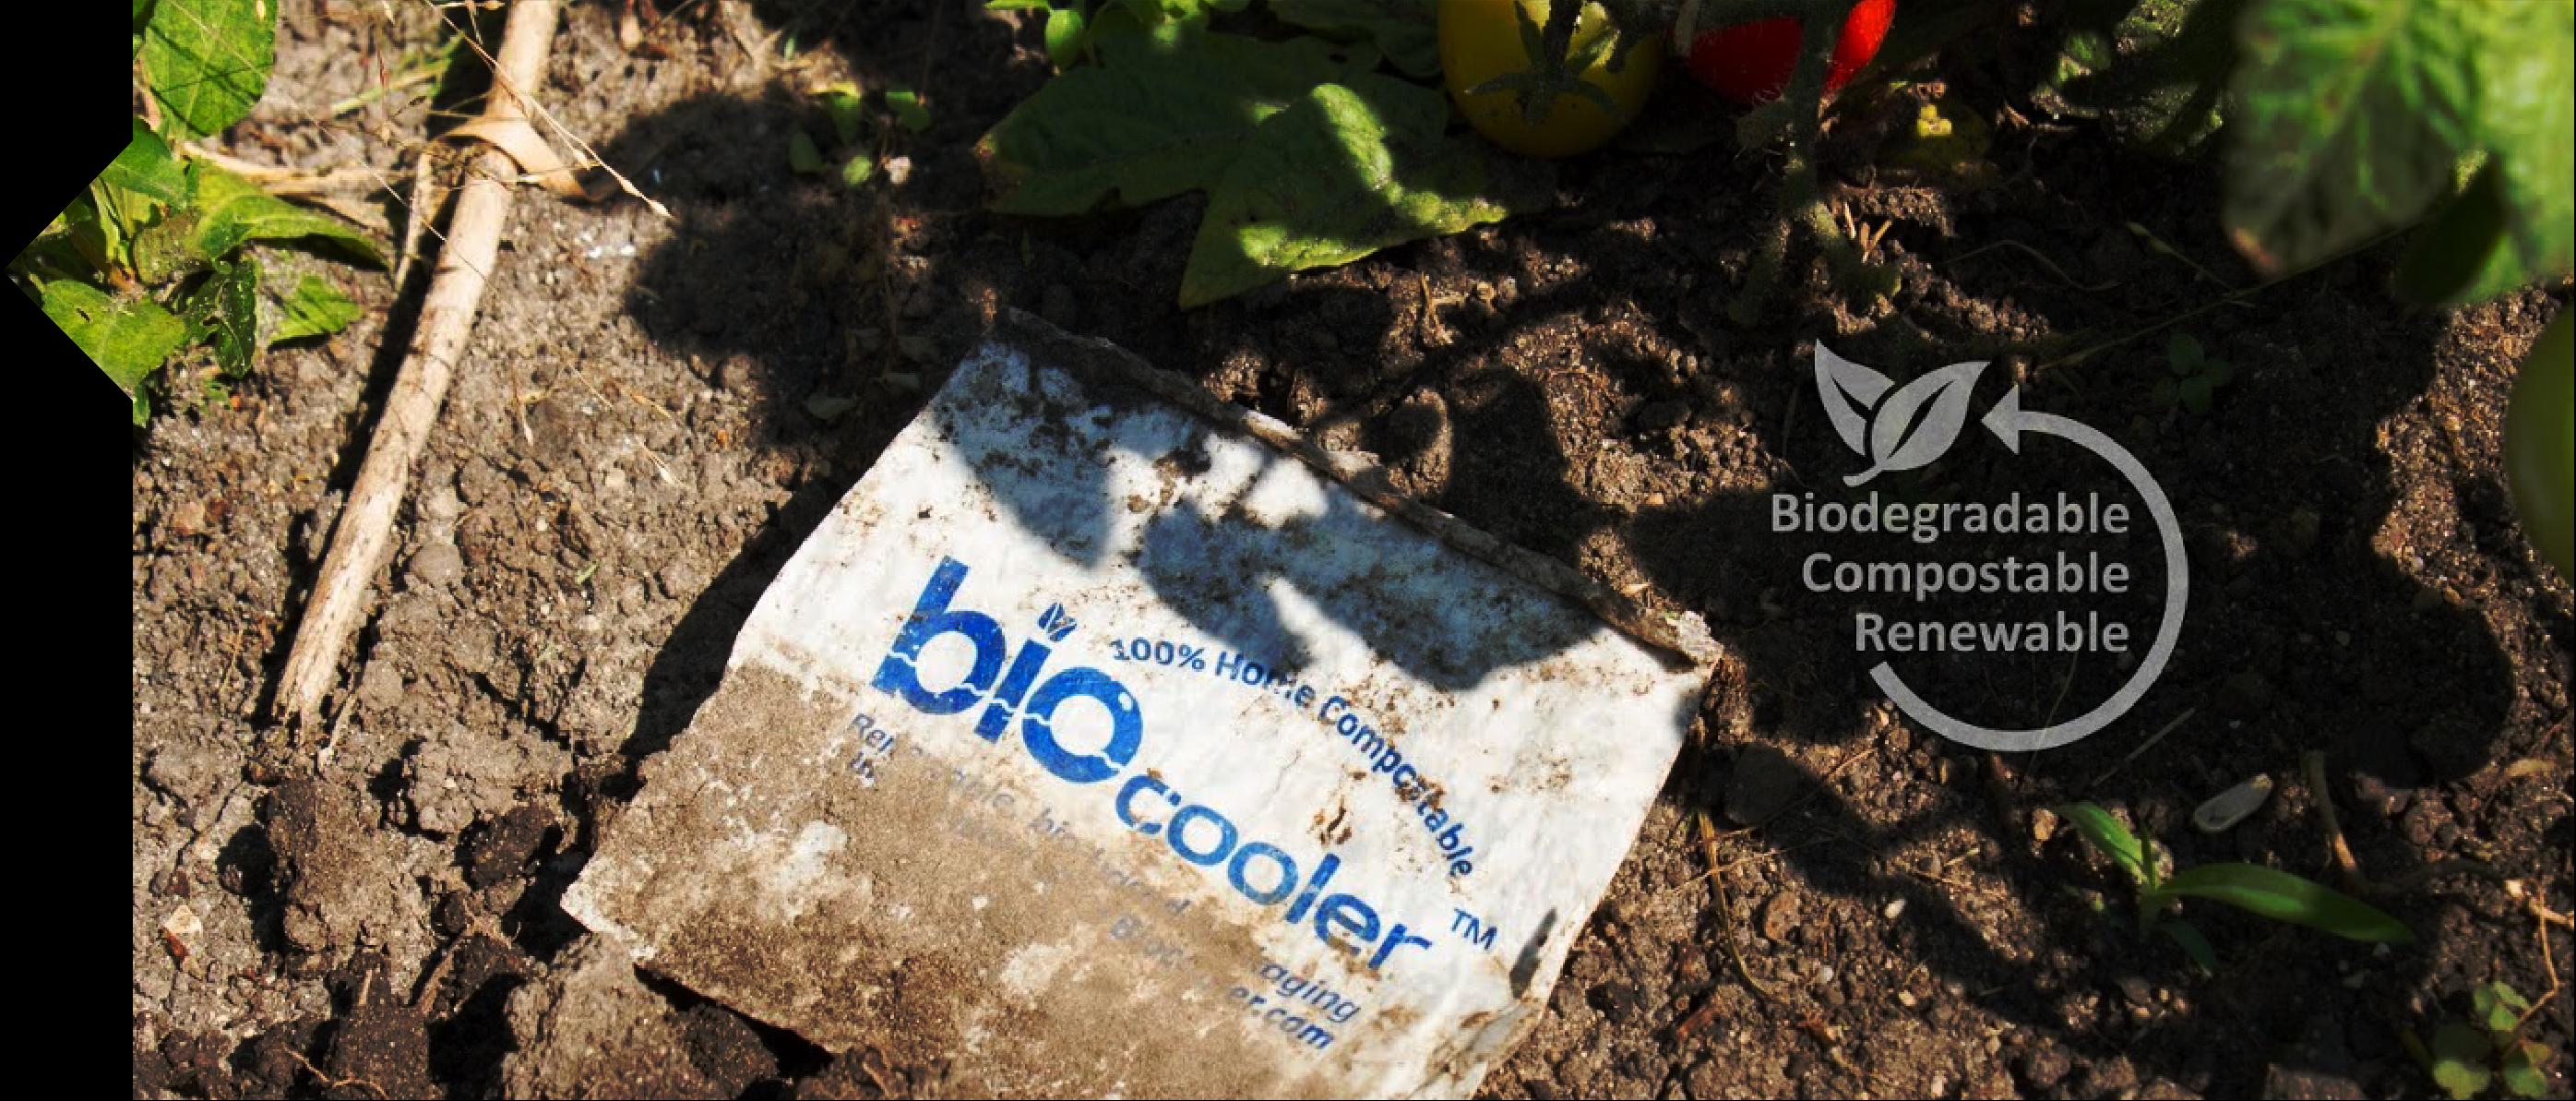 Compostable packaging biocooler biodegradable biobased